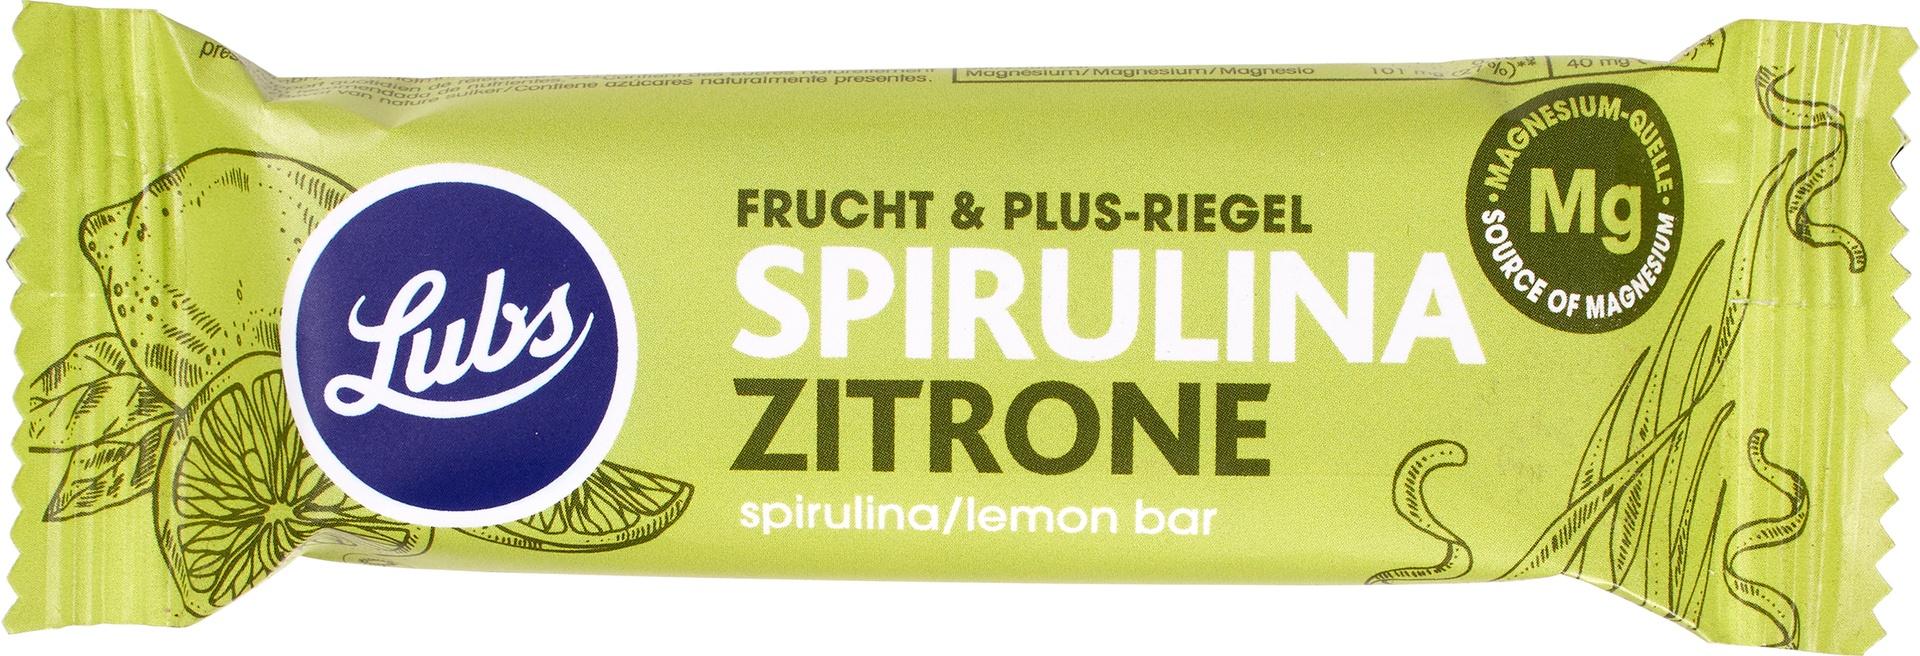 Biologische Lubs Fruitreep spirulina-lemon 40 gr